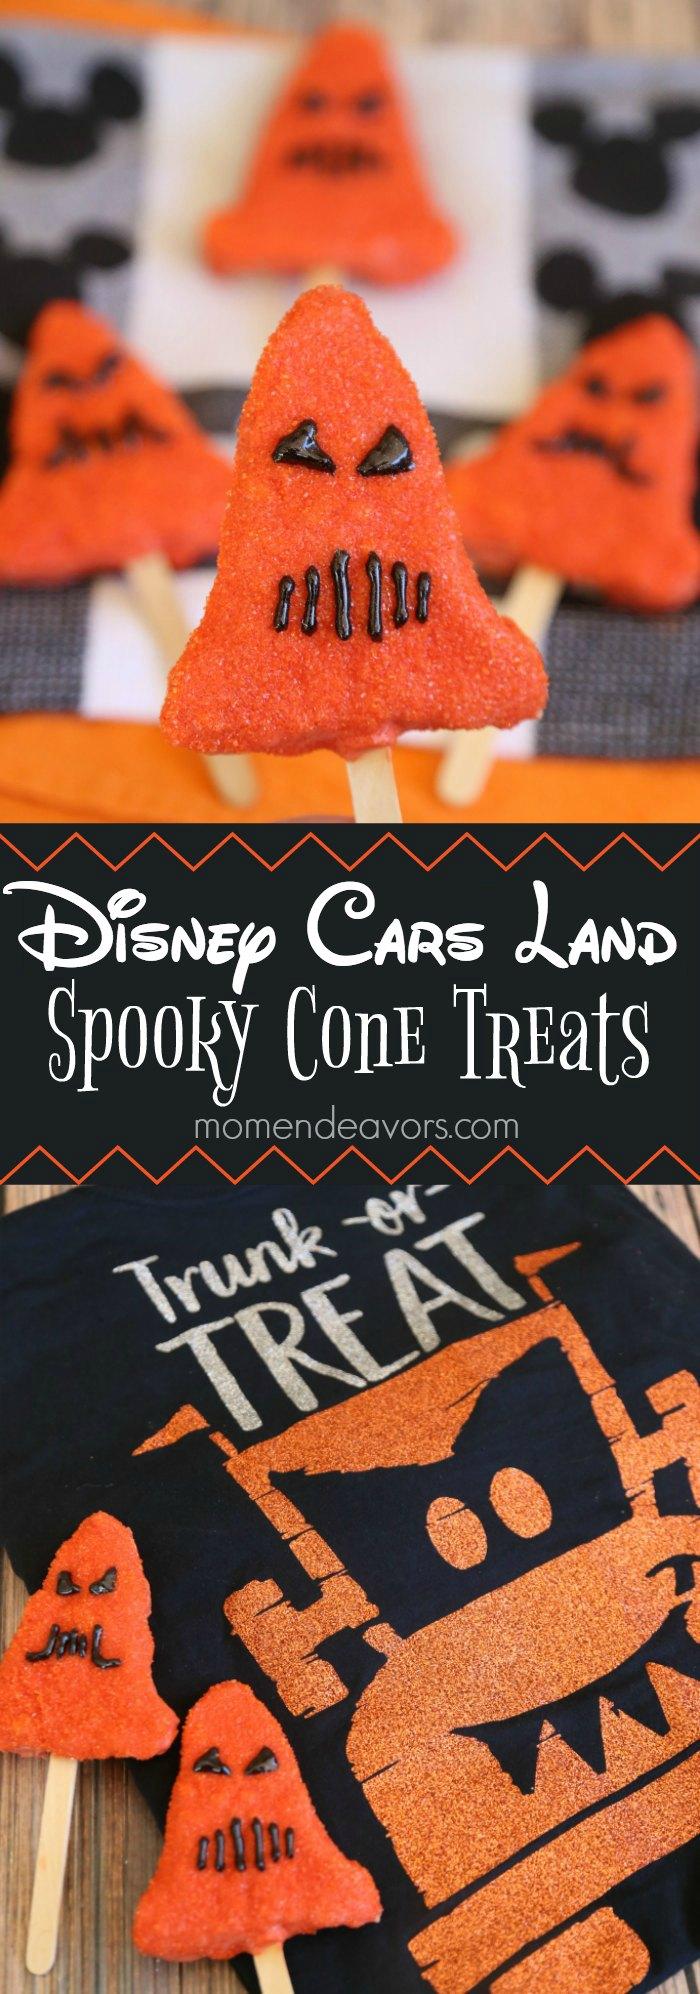 Disney Cars Land Spooky Cone Haul-O-Ween Treats